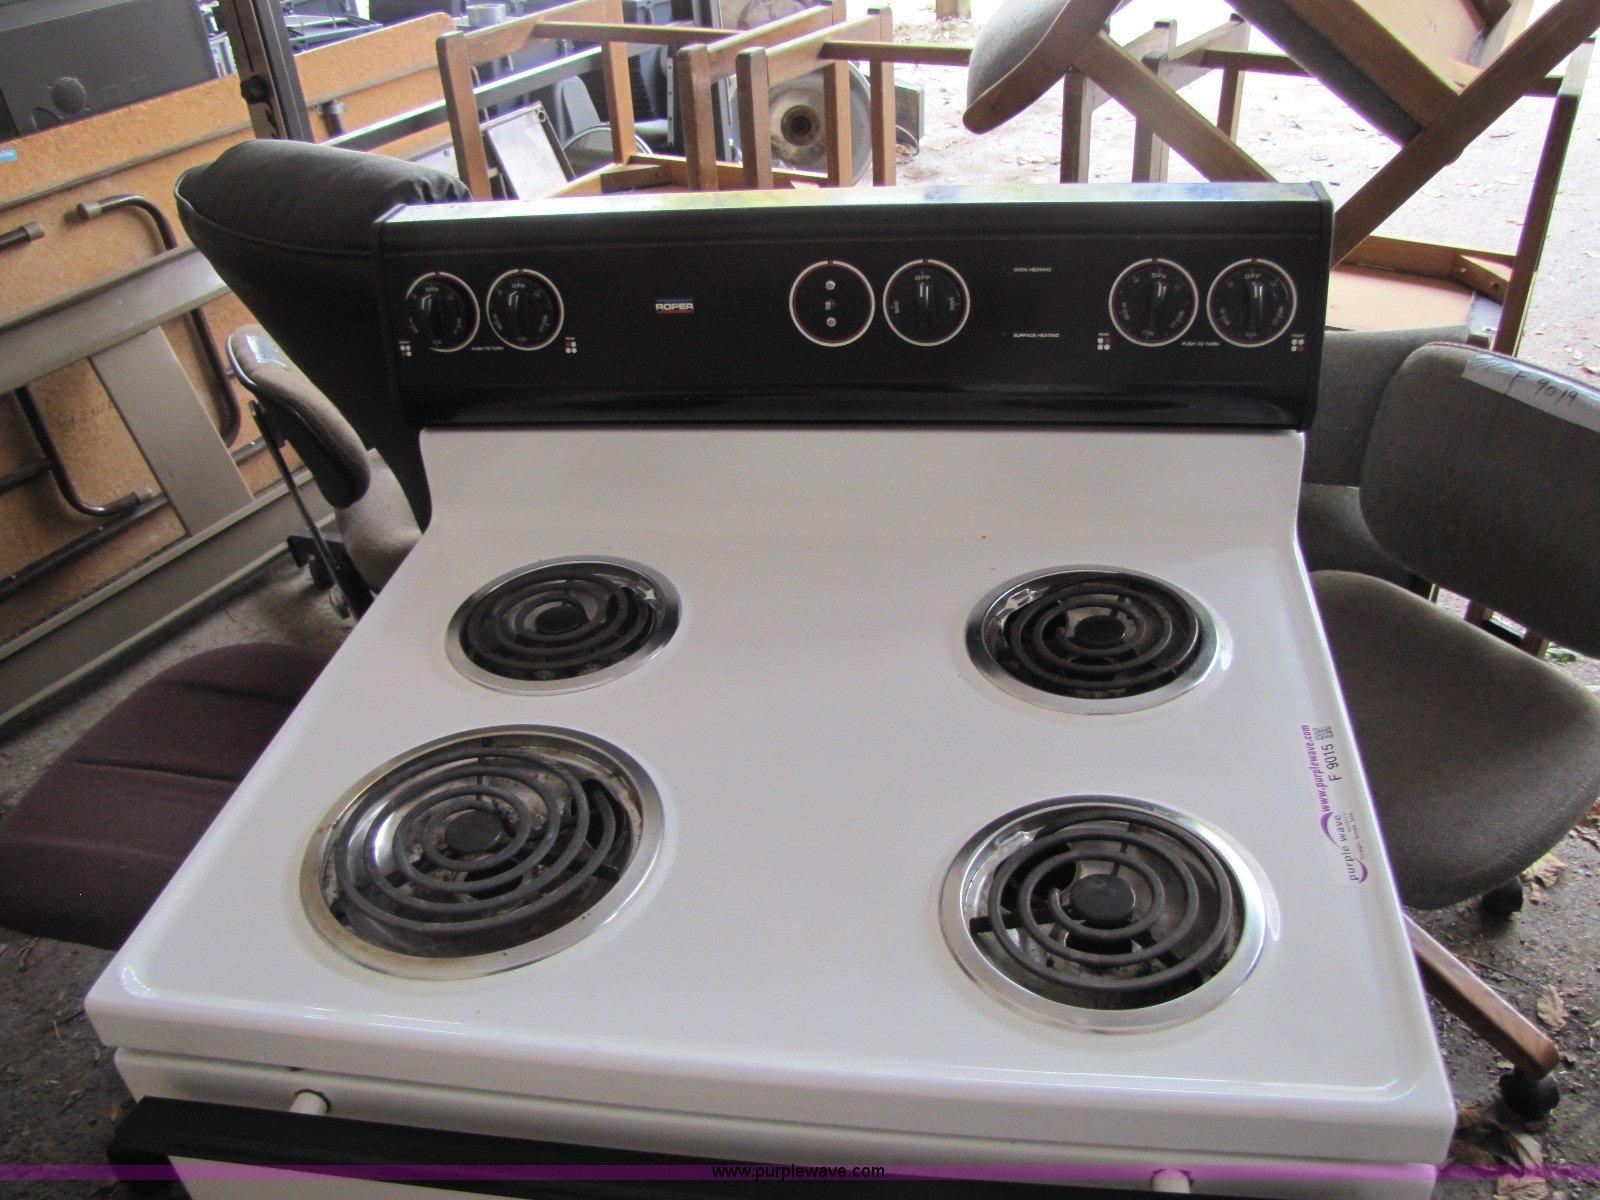 Roper Stove Electric Troubleshooting Range Wiring Diagram Four Burner Oven Item F9015 Sold November 8